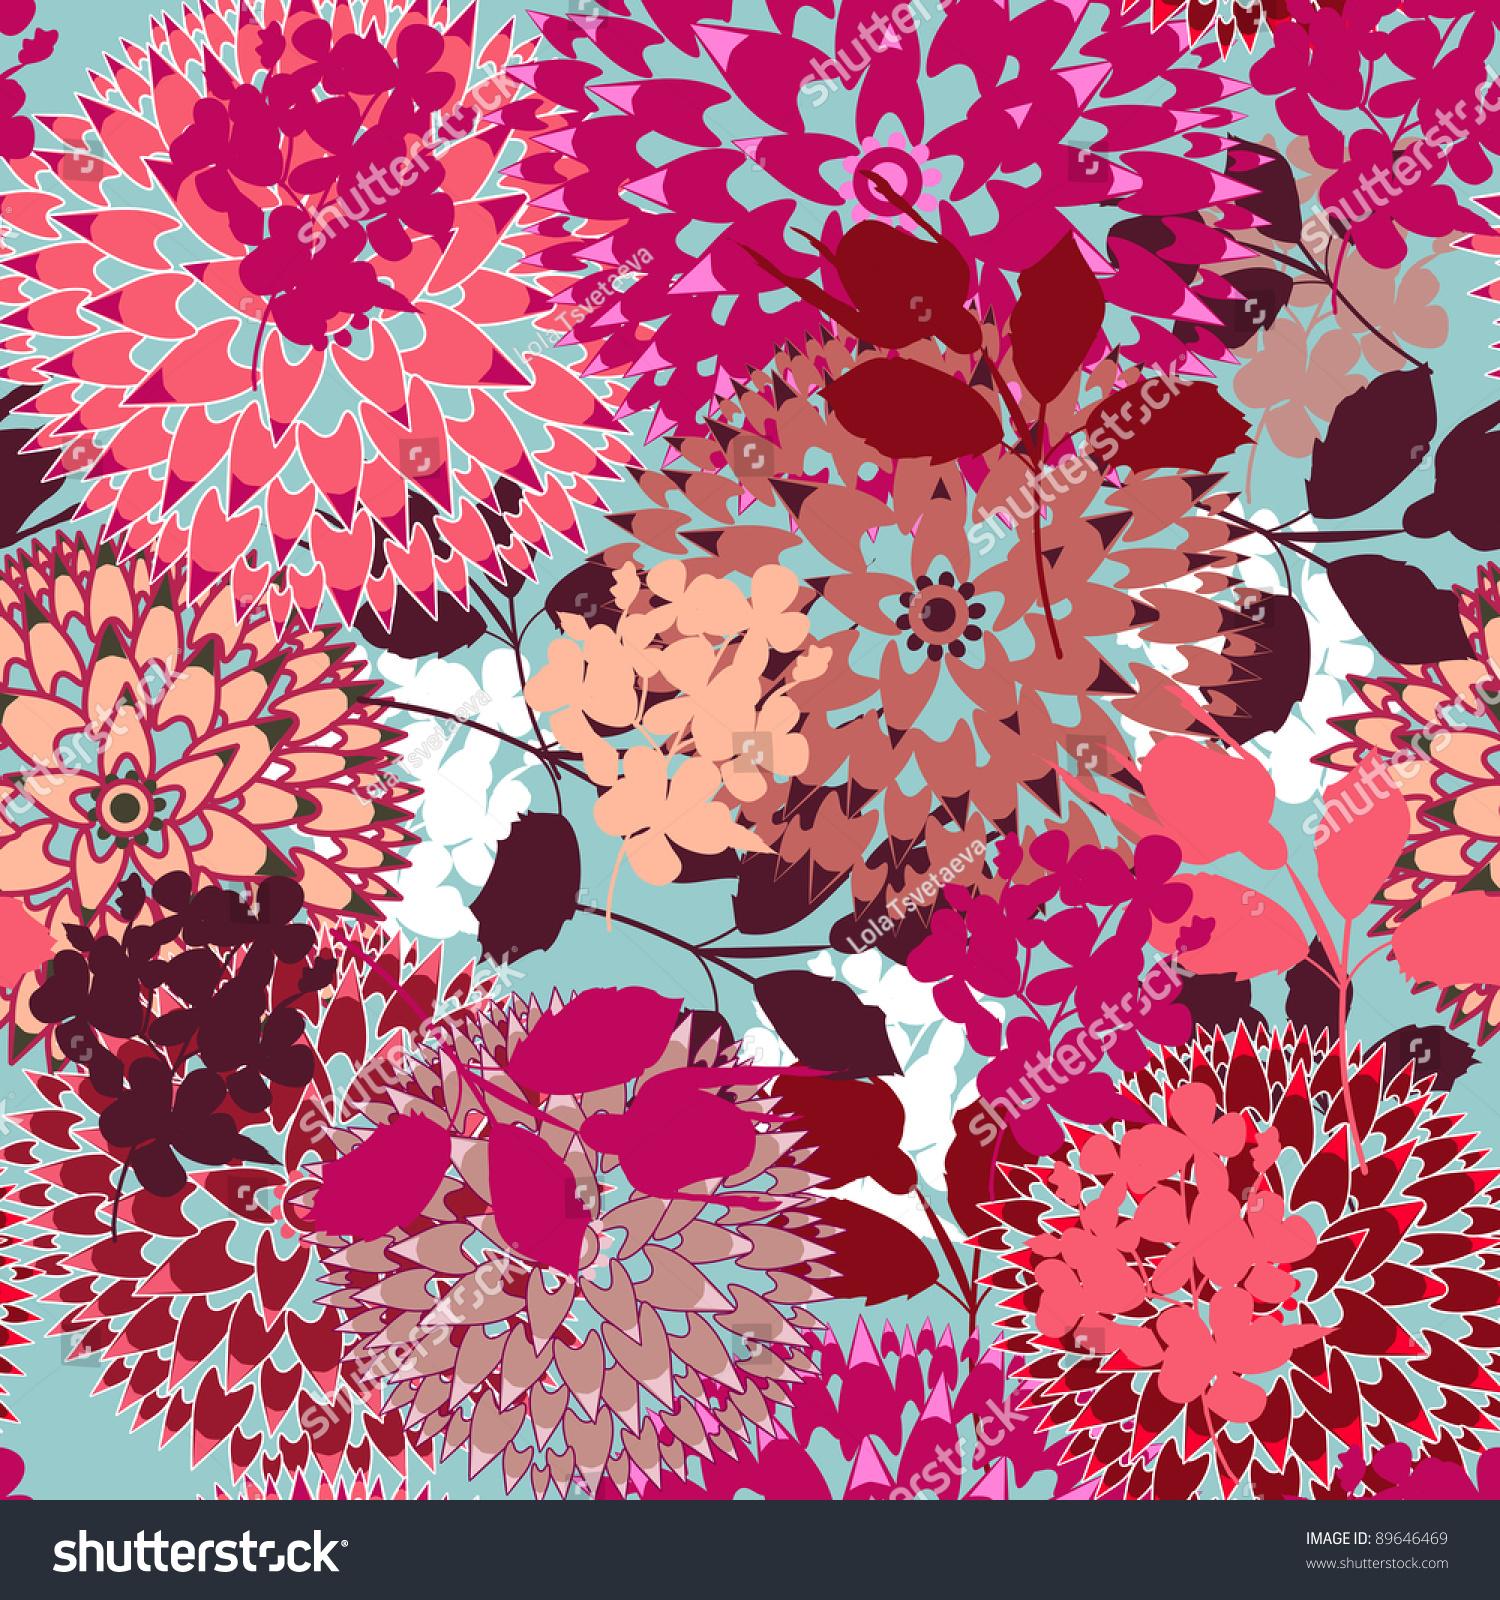 Bright Floral Pattern Stock Vector Illustration 89646469 ...